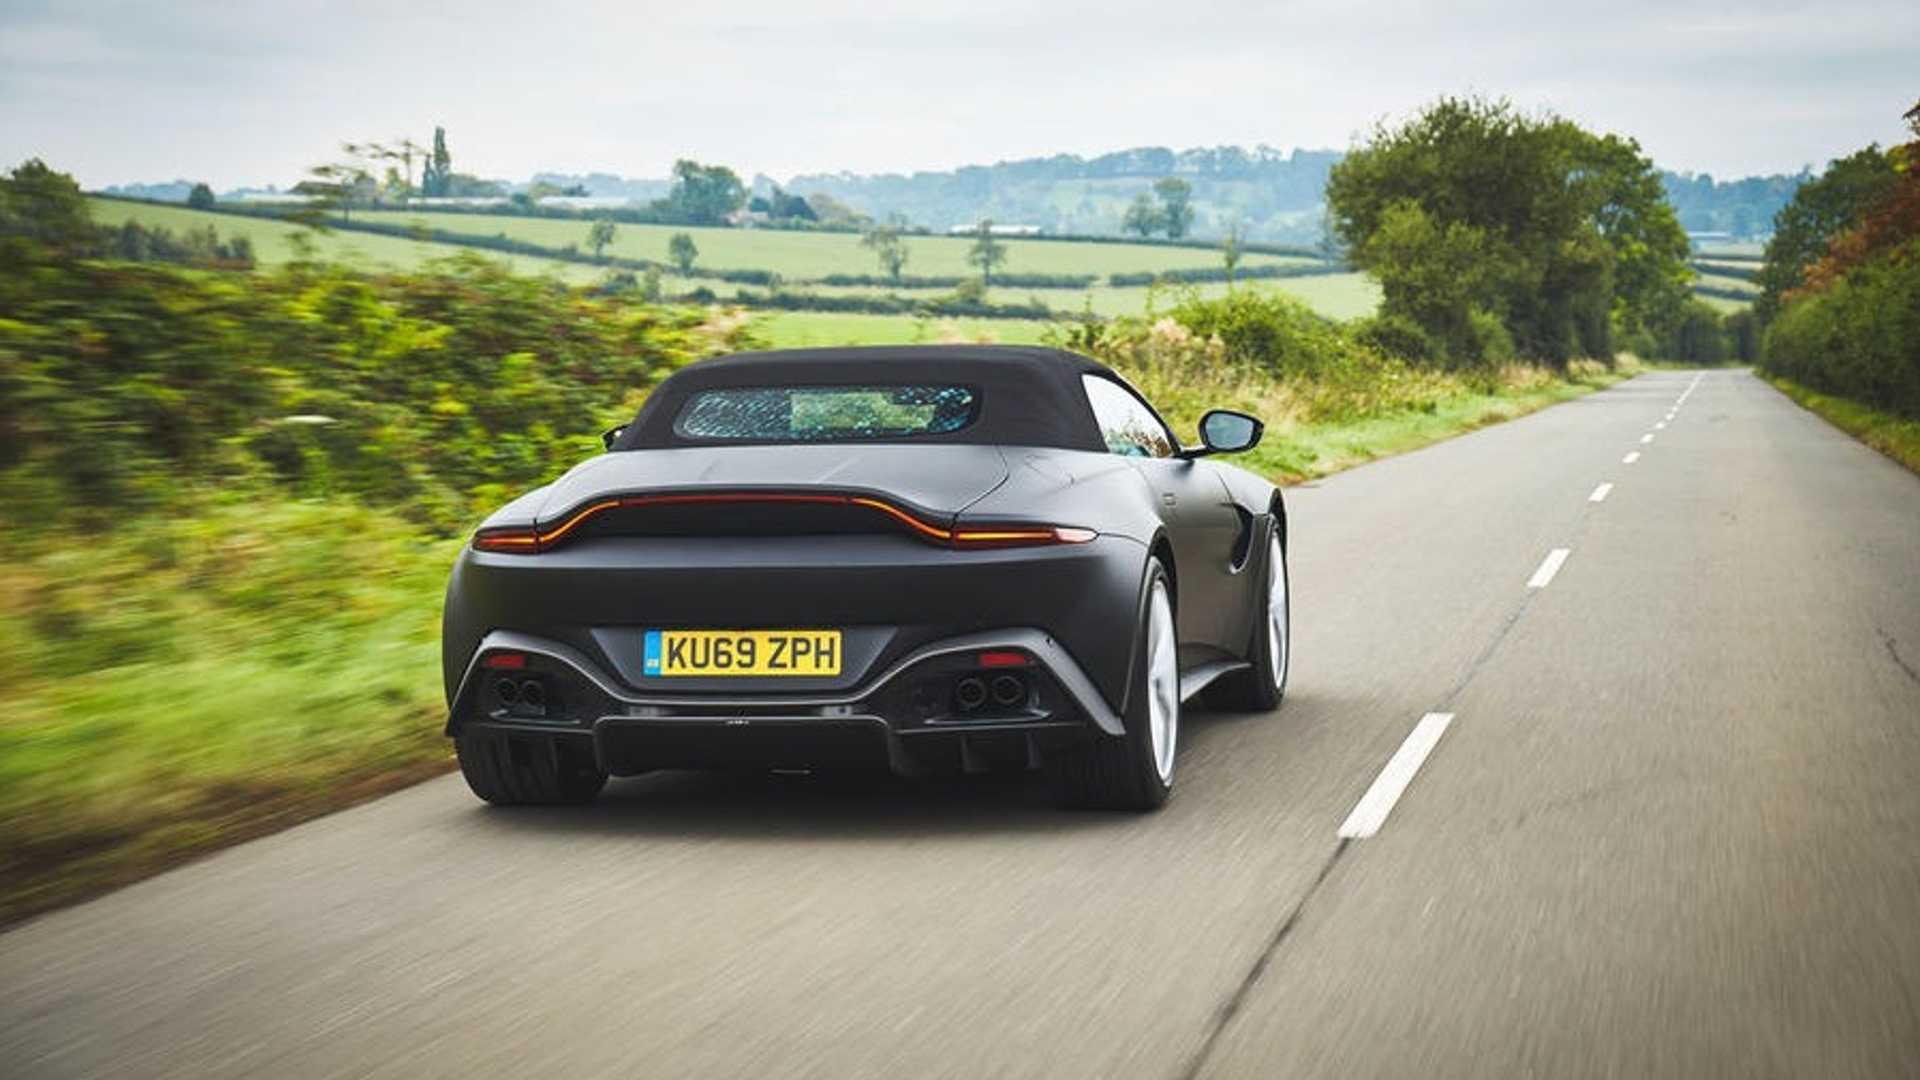 2020 Aston Martin V8 Vantage Roadster Official Photos Revealed Gtspirit